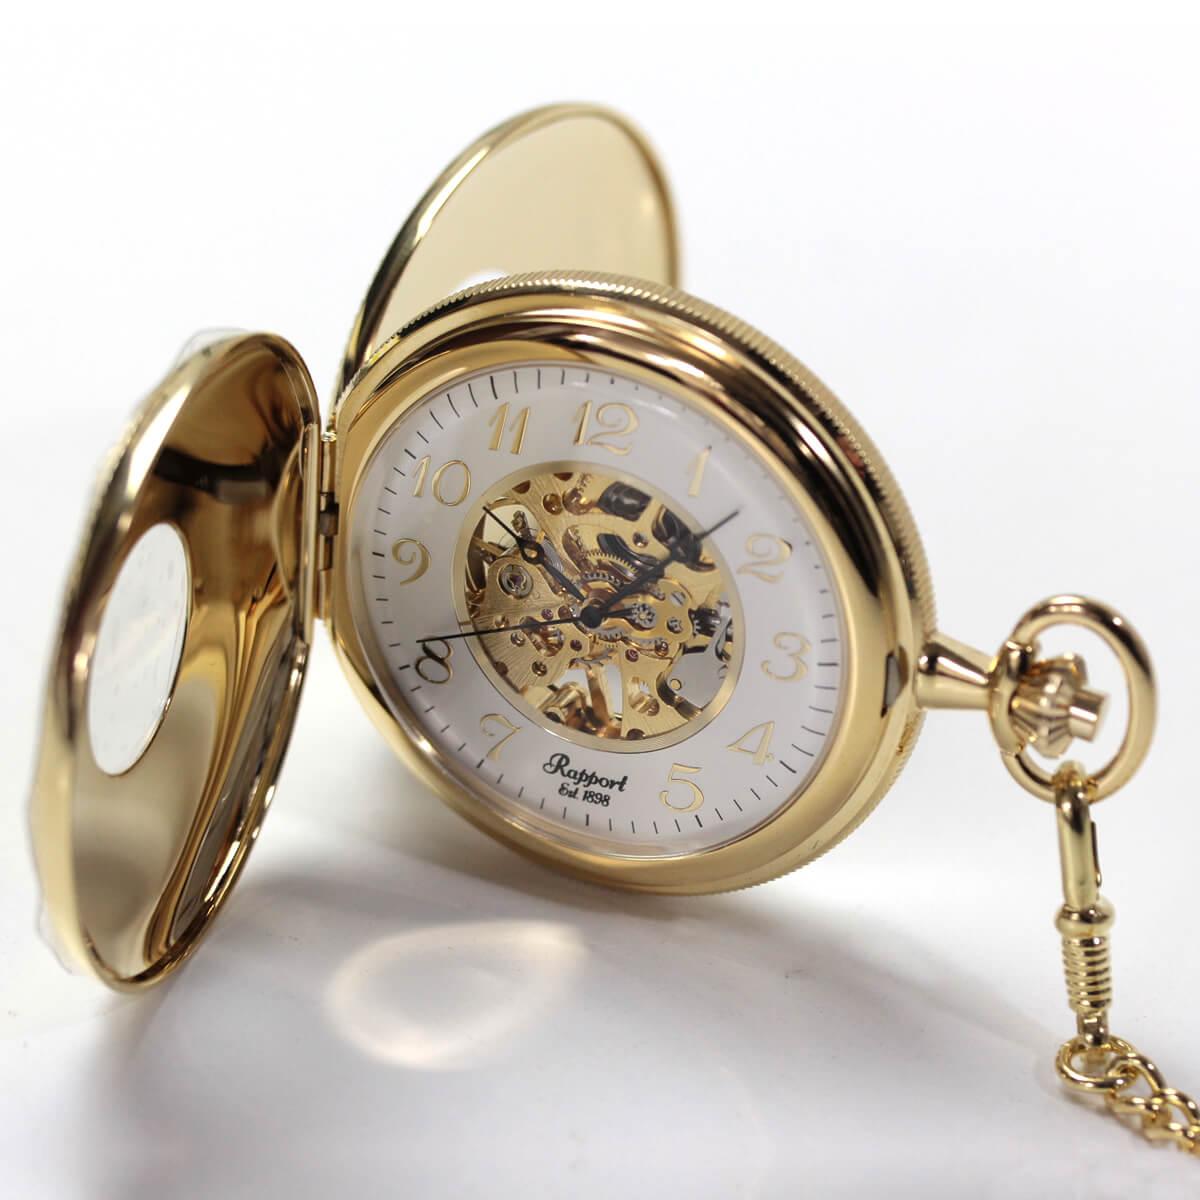 pw46 ラポート 両蓋開き懐中時計